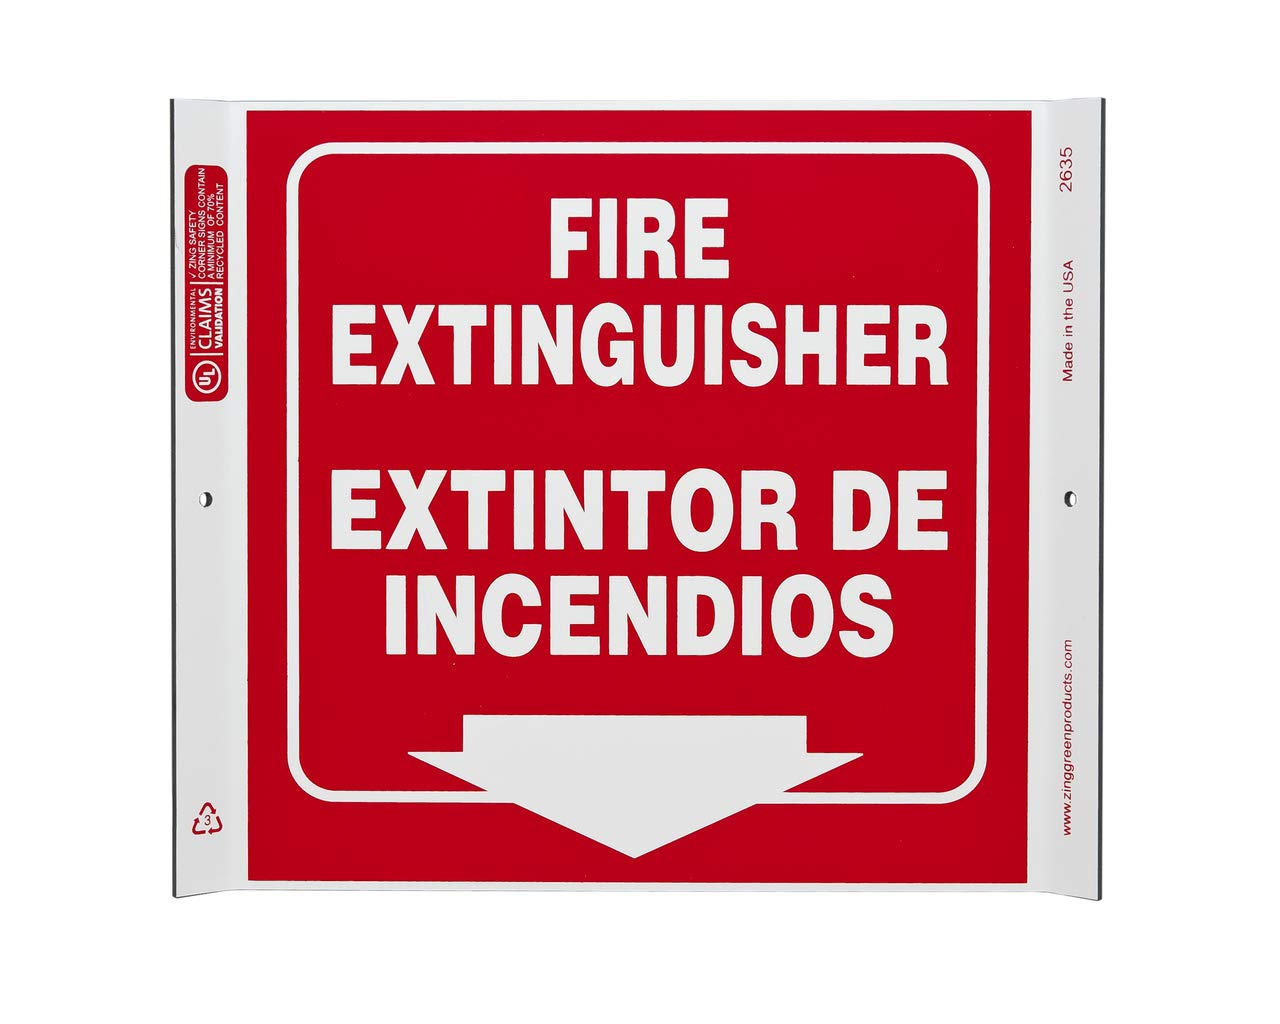 ZING 2635 Señal de esquina, extintor bilingüe, 10 x 10 W ...